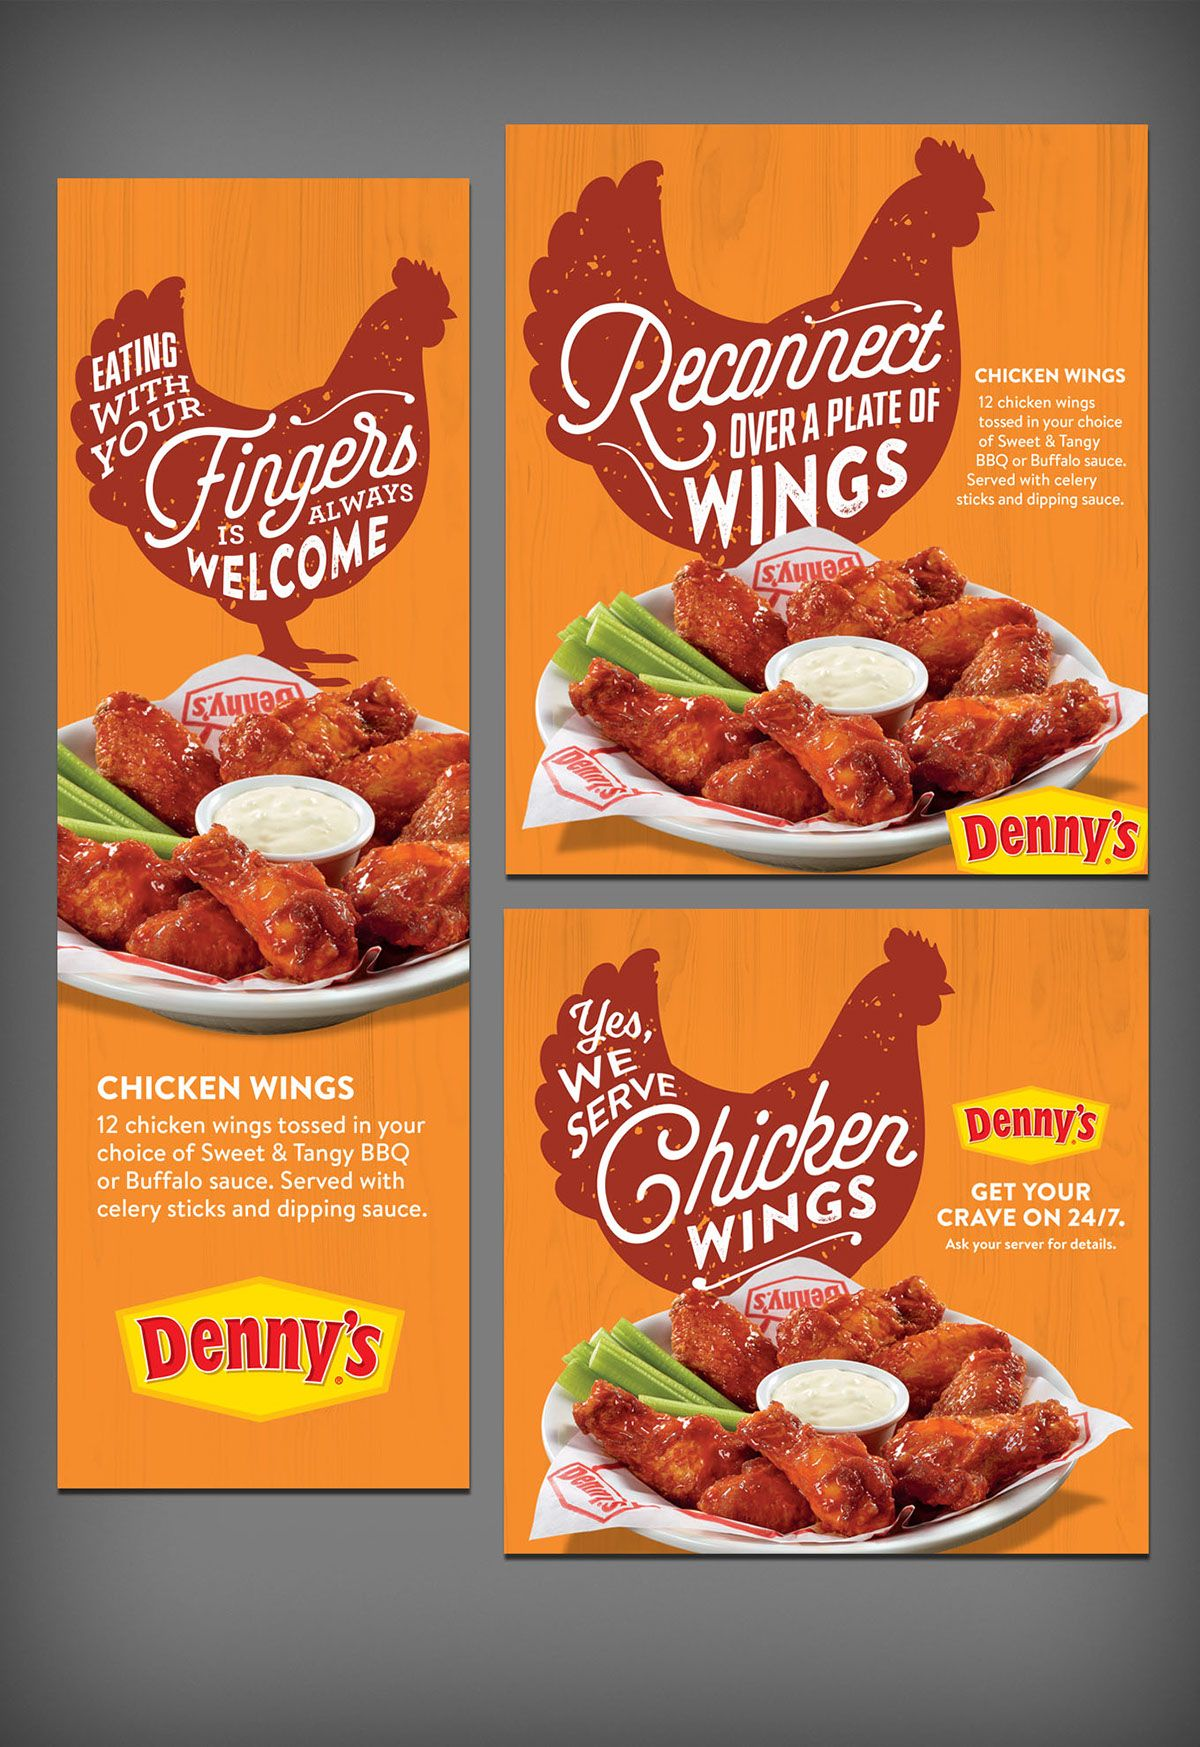 Denny S Franchisee Internal Promo Designs On Behance In 2020 Food Menu Design Food Poster Design Food Advertising